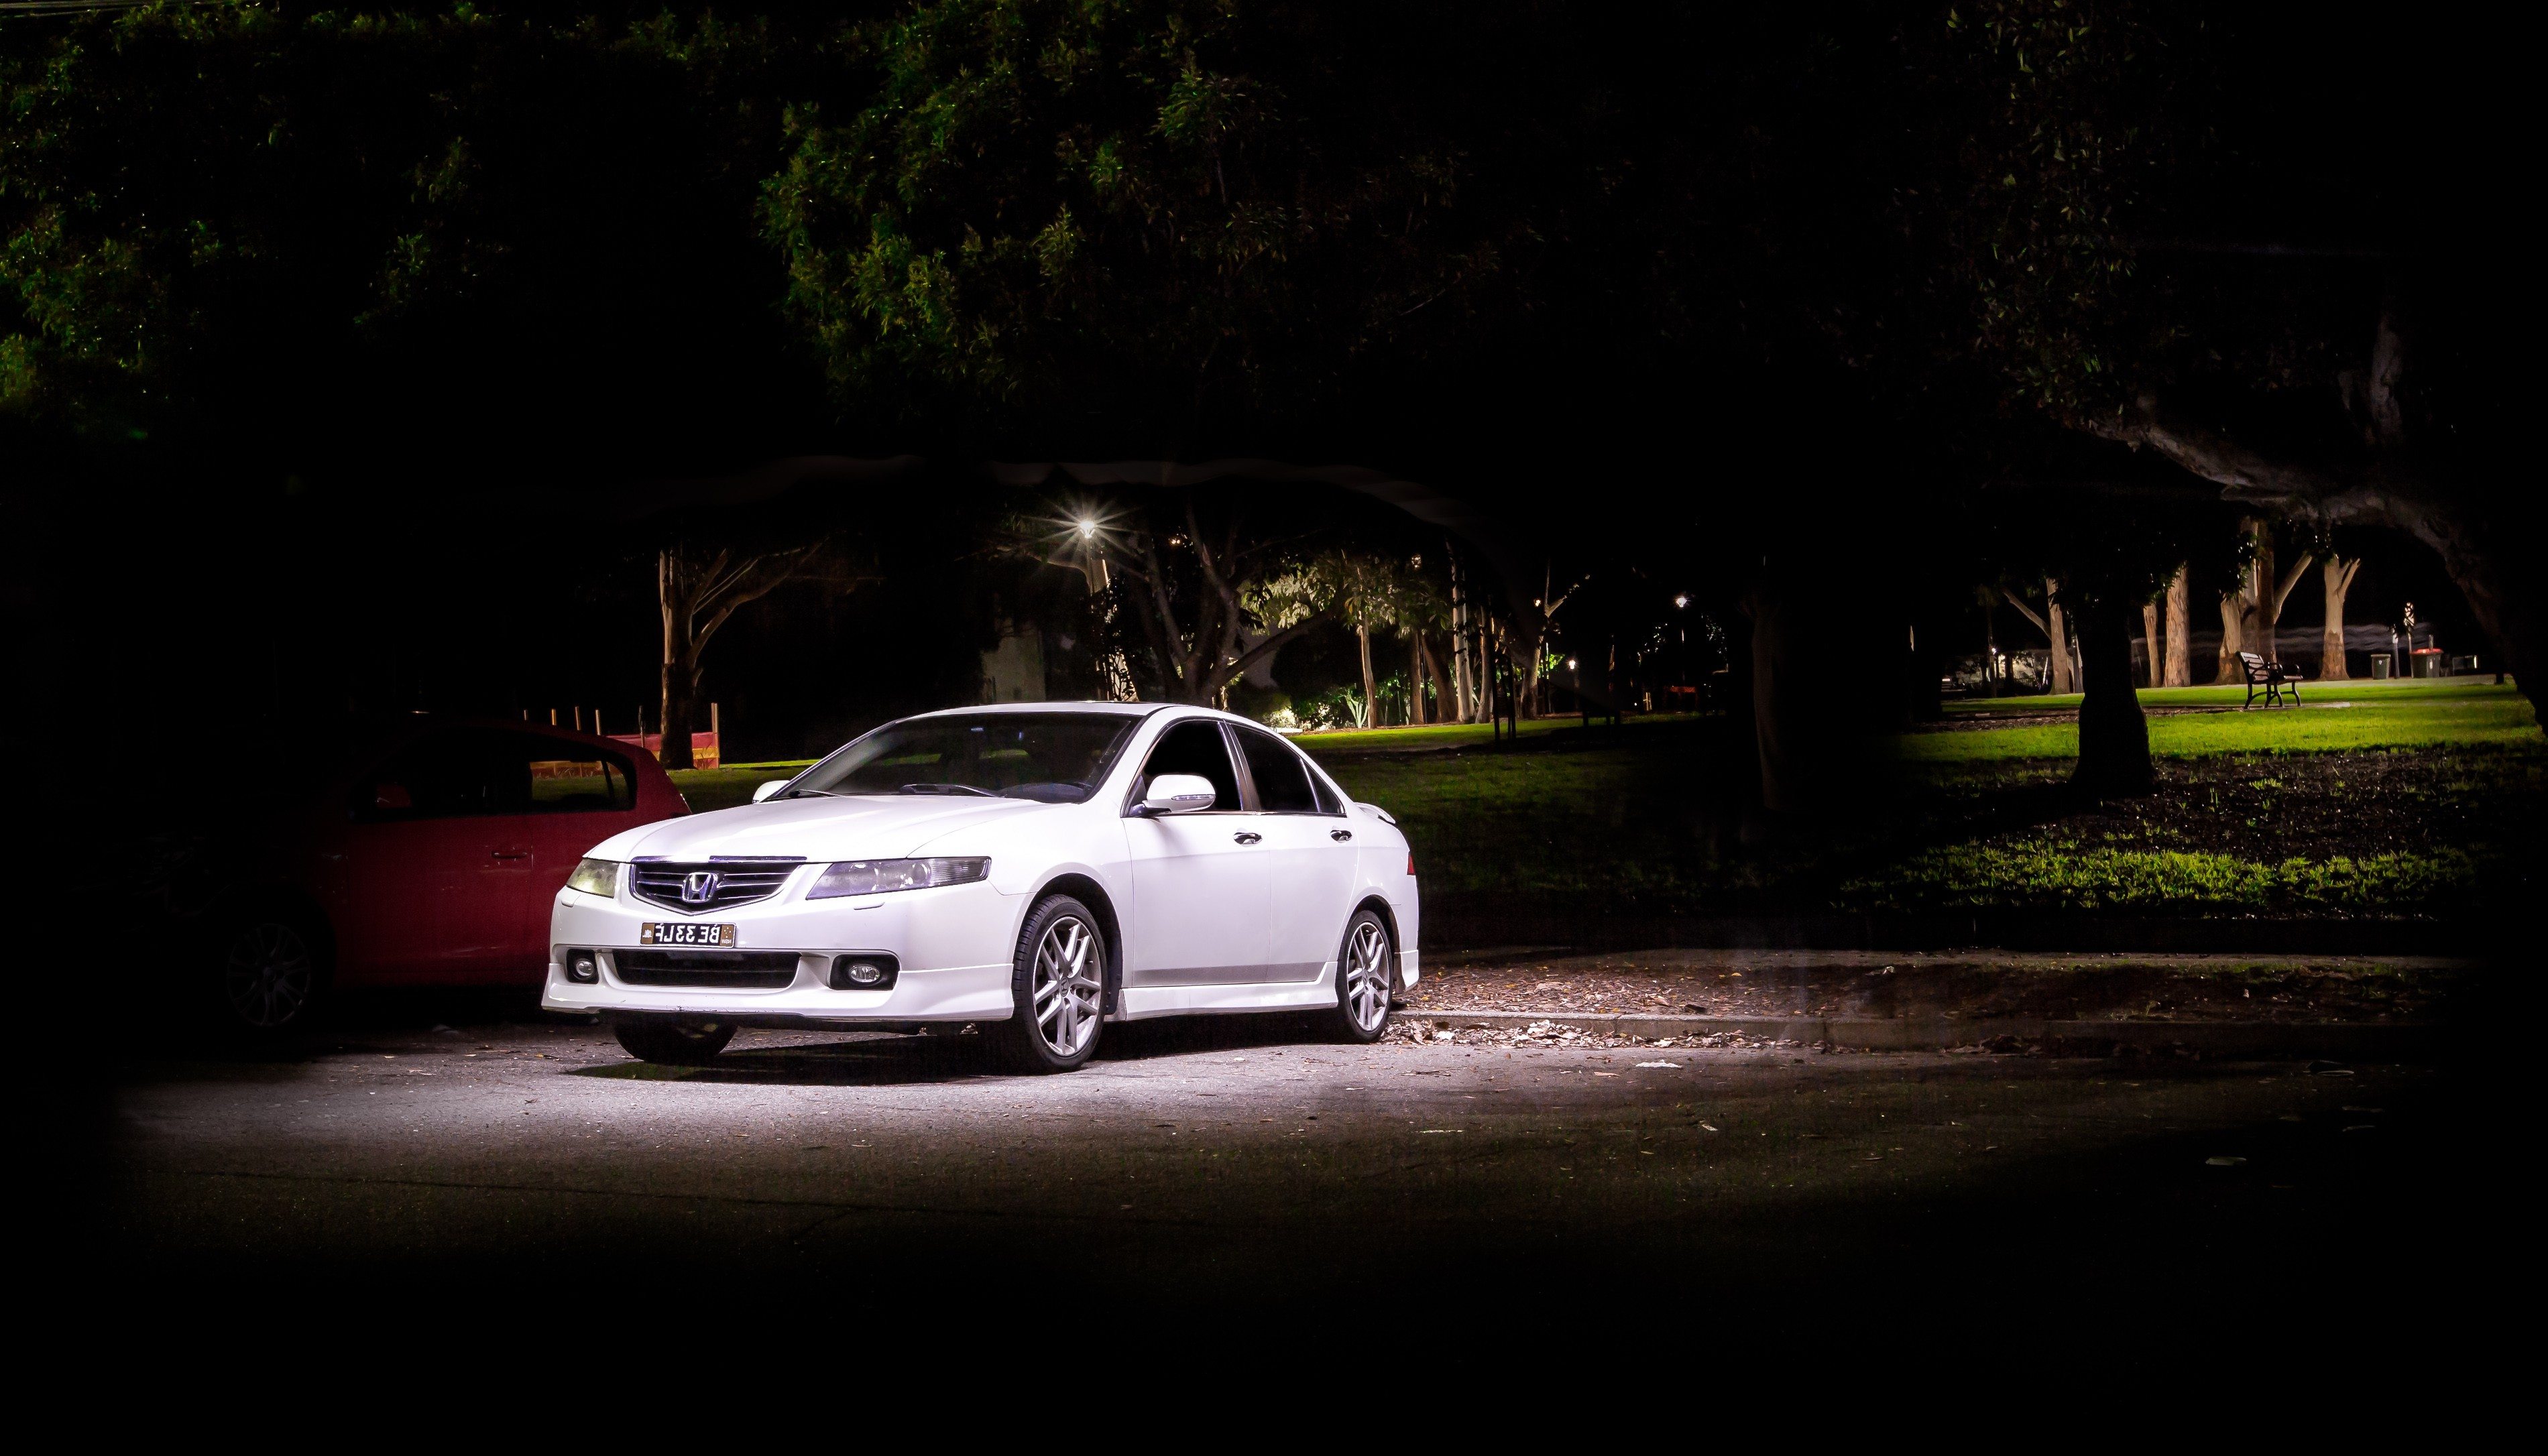 Honda Accord Euro Long exposure light painting night automotive photography